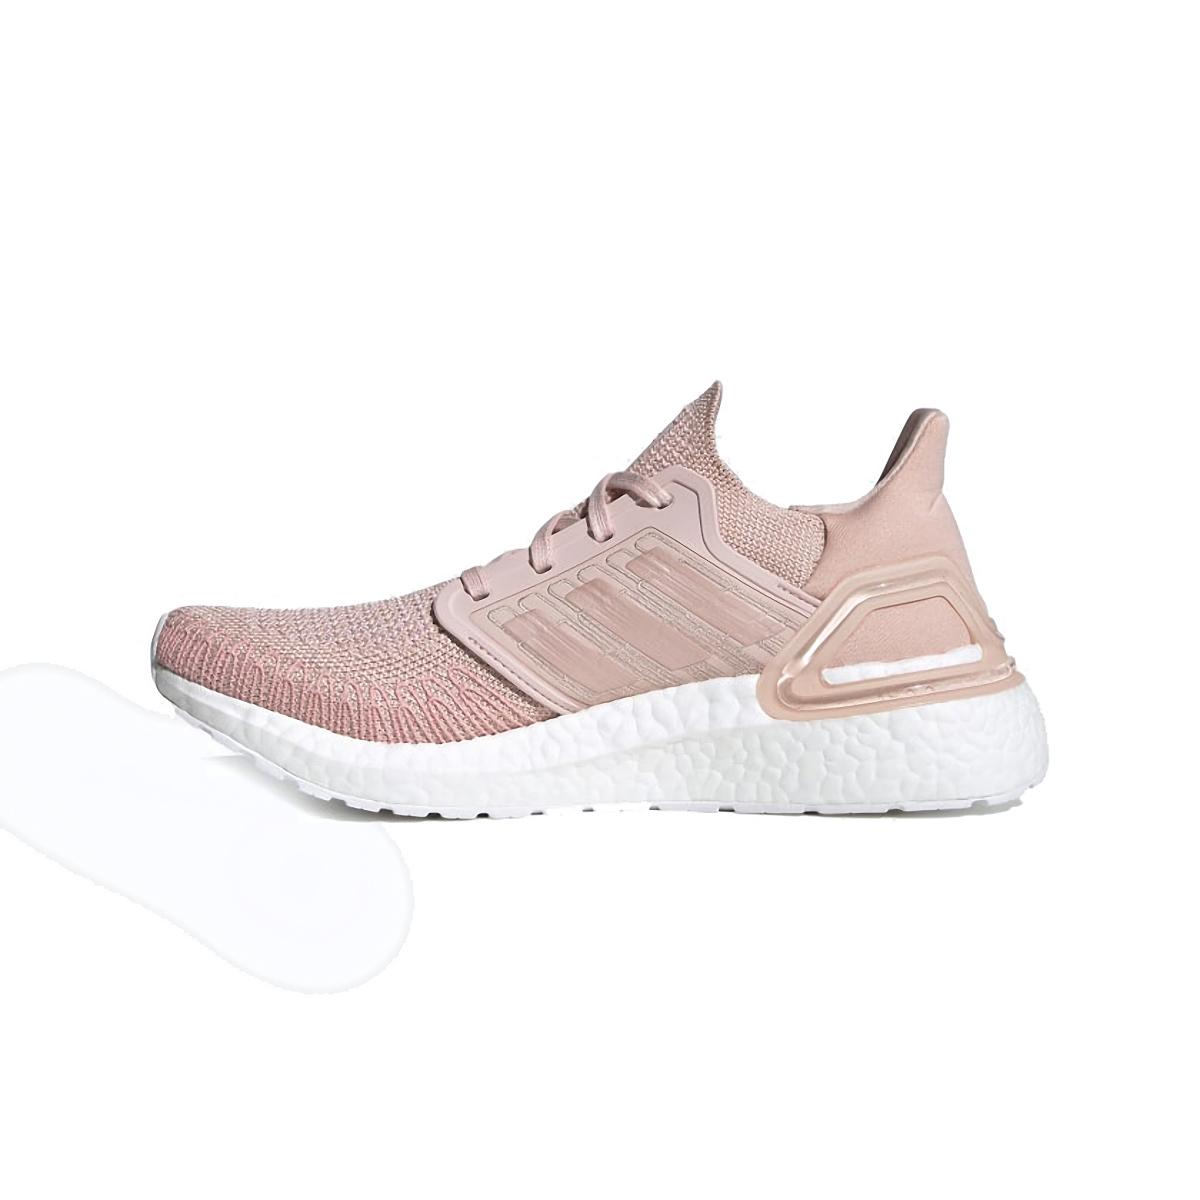 Women's Adidas Ultraboost 20 Running Shoe - Color: Vapour Pink/Cloud White - Size: 5 - Width: Regular, Vapour Pink/Cloud White, large, image 2